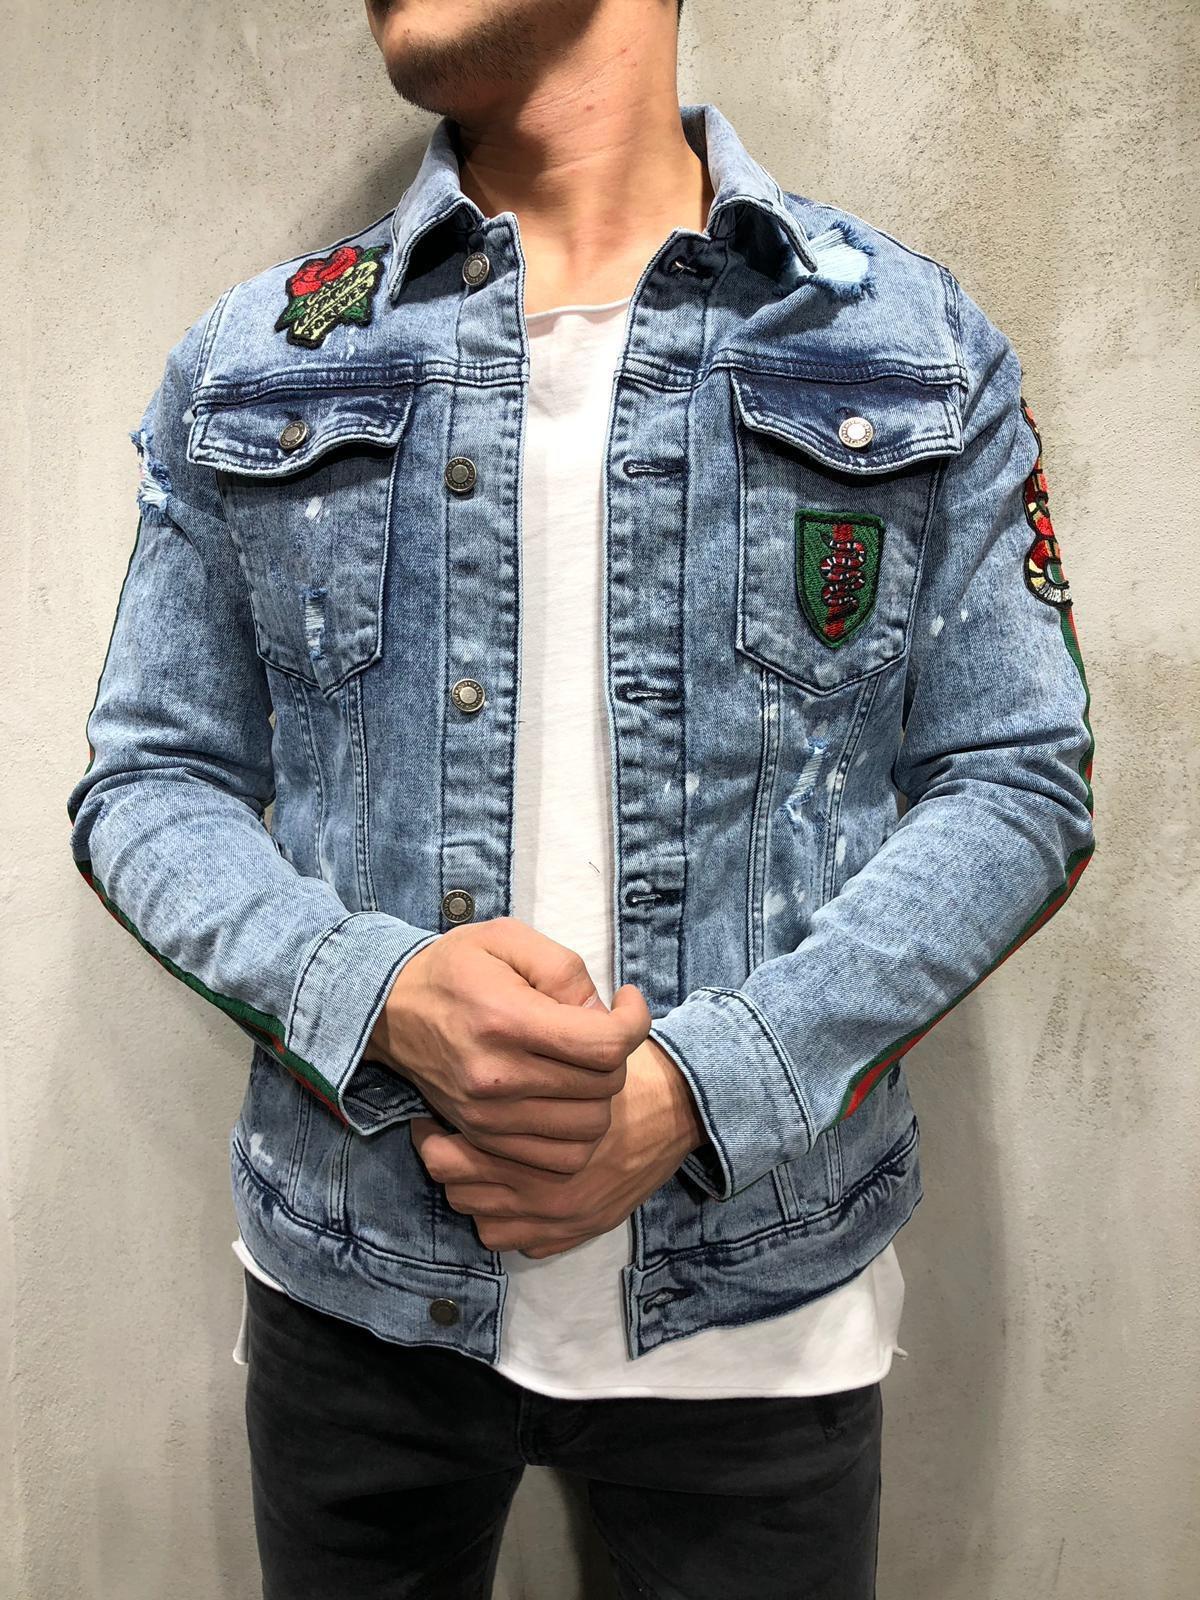 Denim Jacket Snake Patch Embroidery Light Mens Street Style Denim Jacket Mens Outfits [ 1600 x 1200 Pixel ]